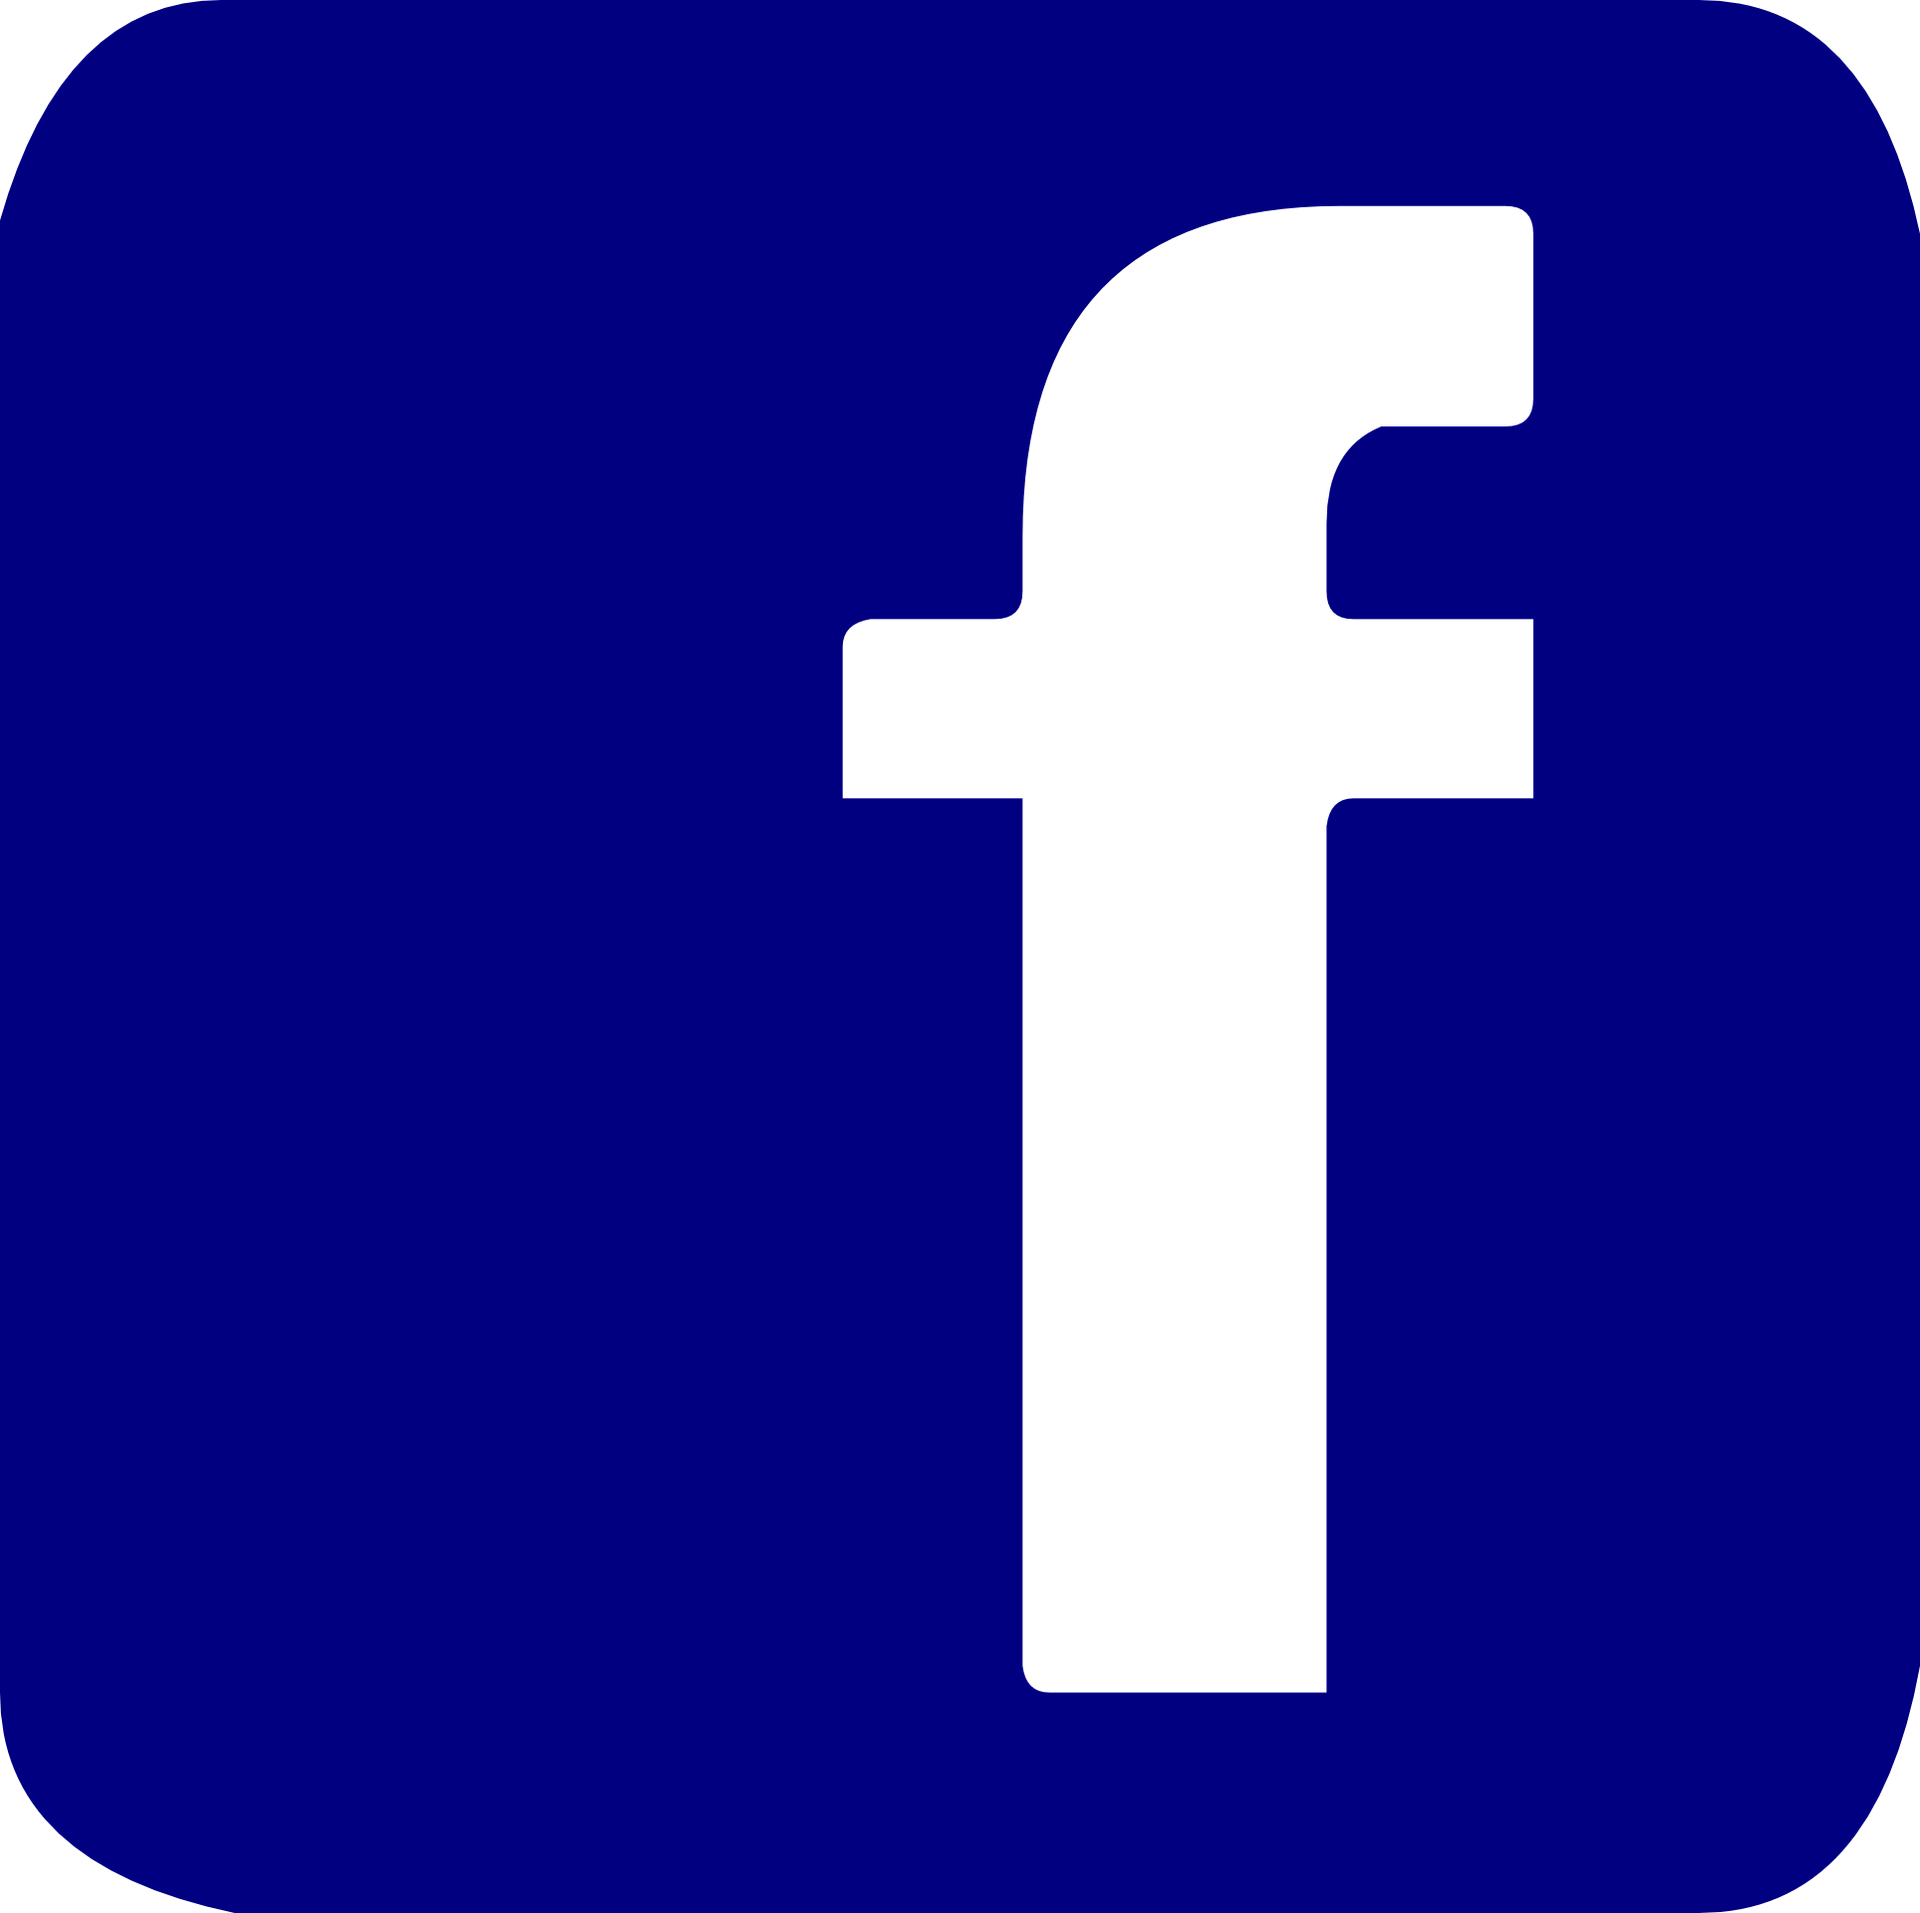 facebook-667456_1920.png